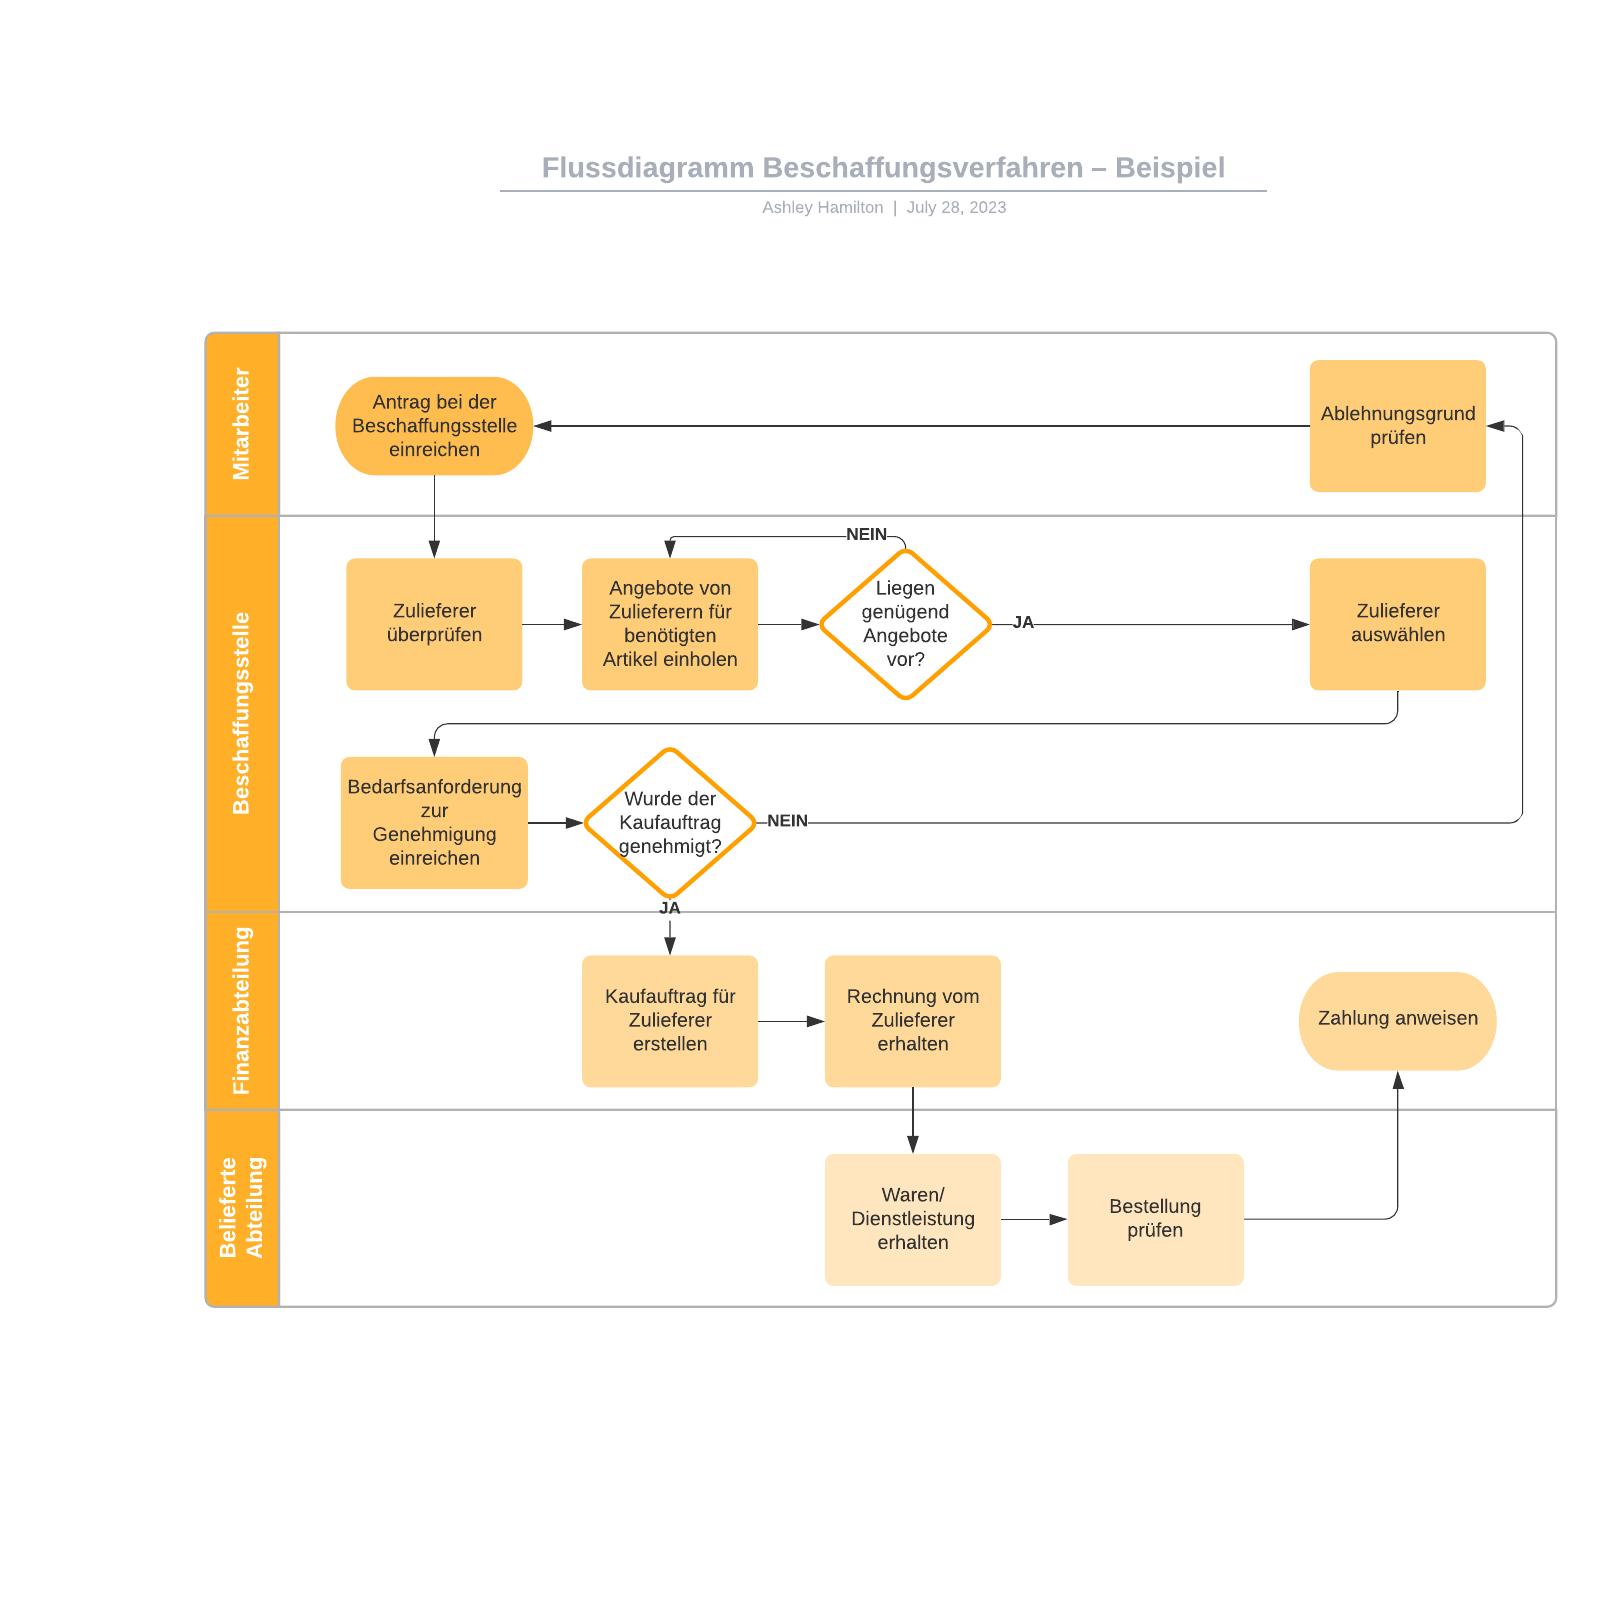 Beschaffungsverfahren Flussdiagramm – Beispiel